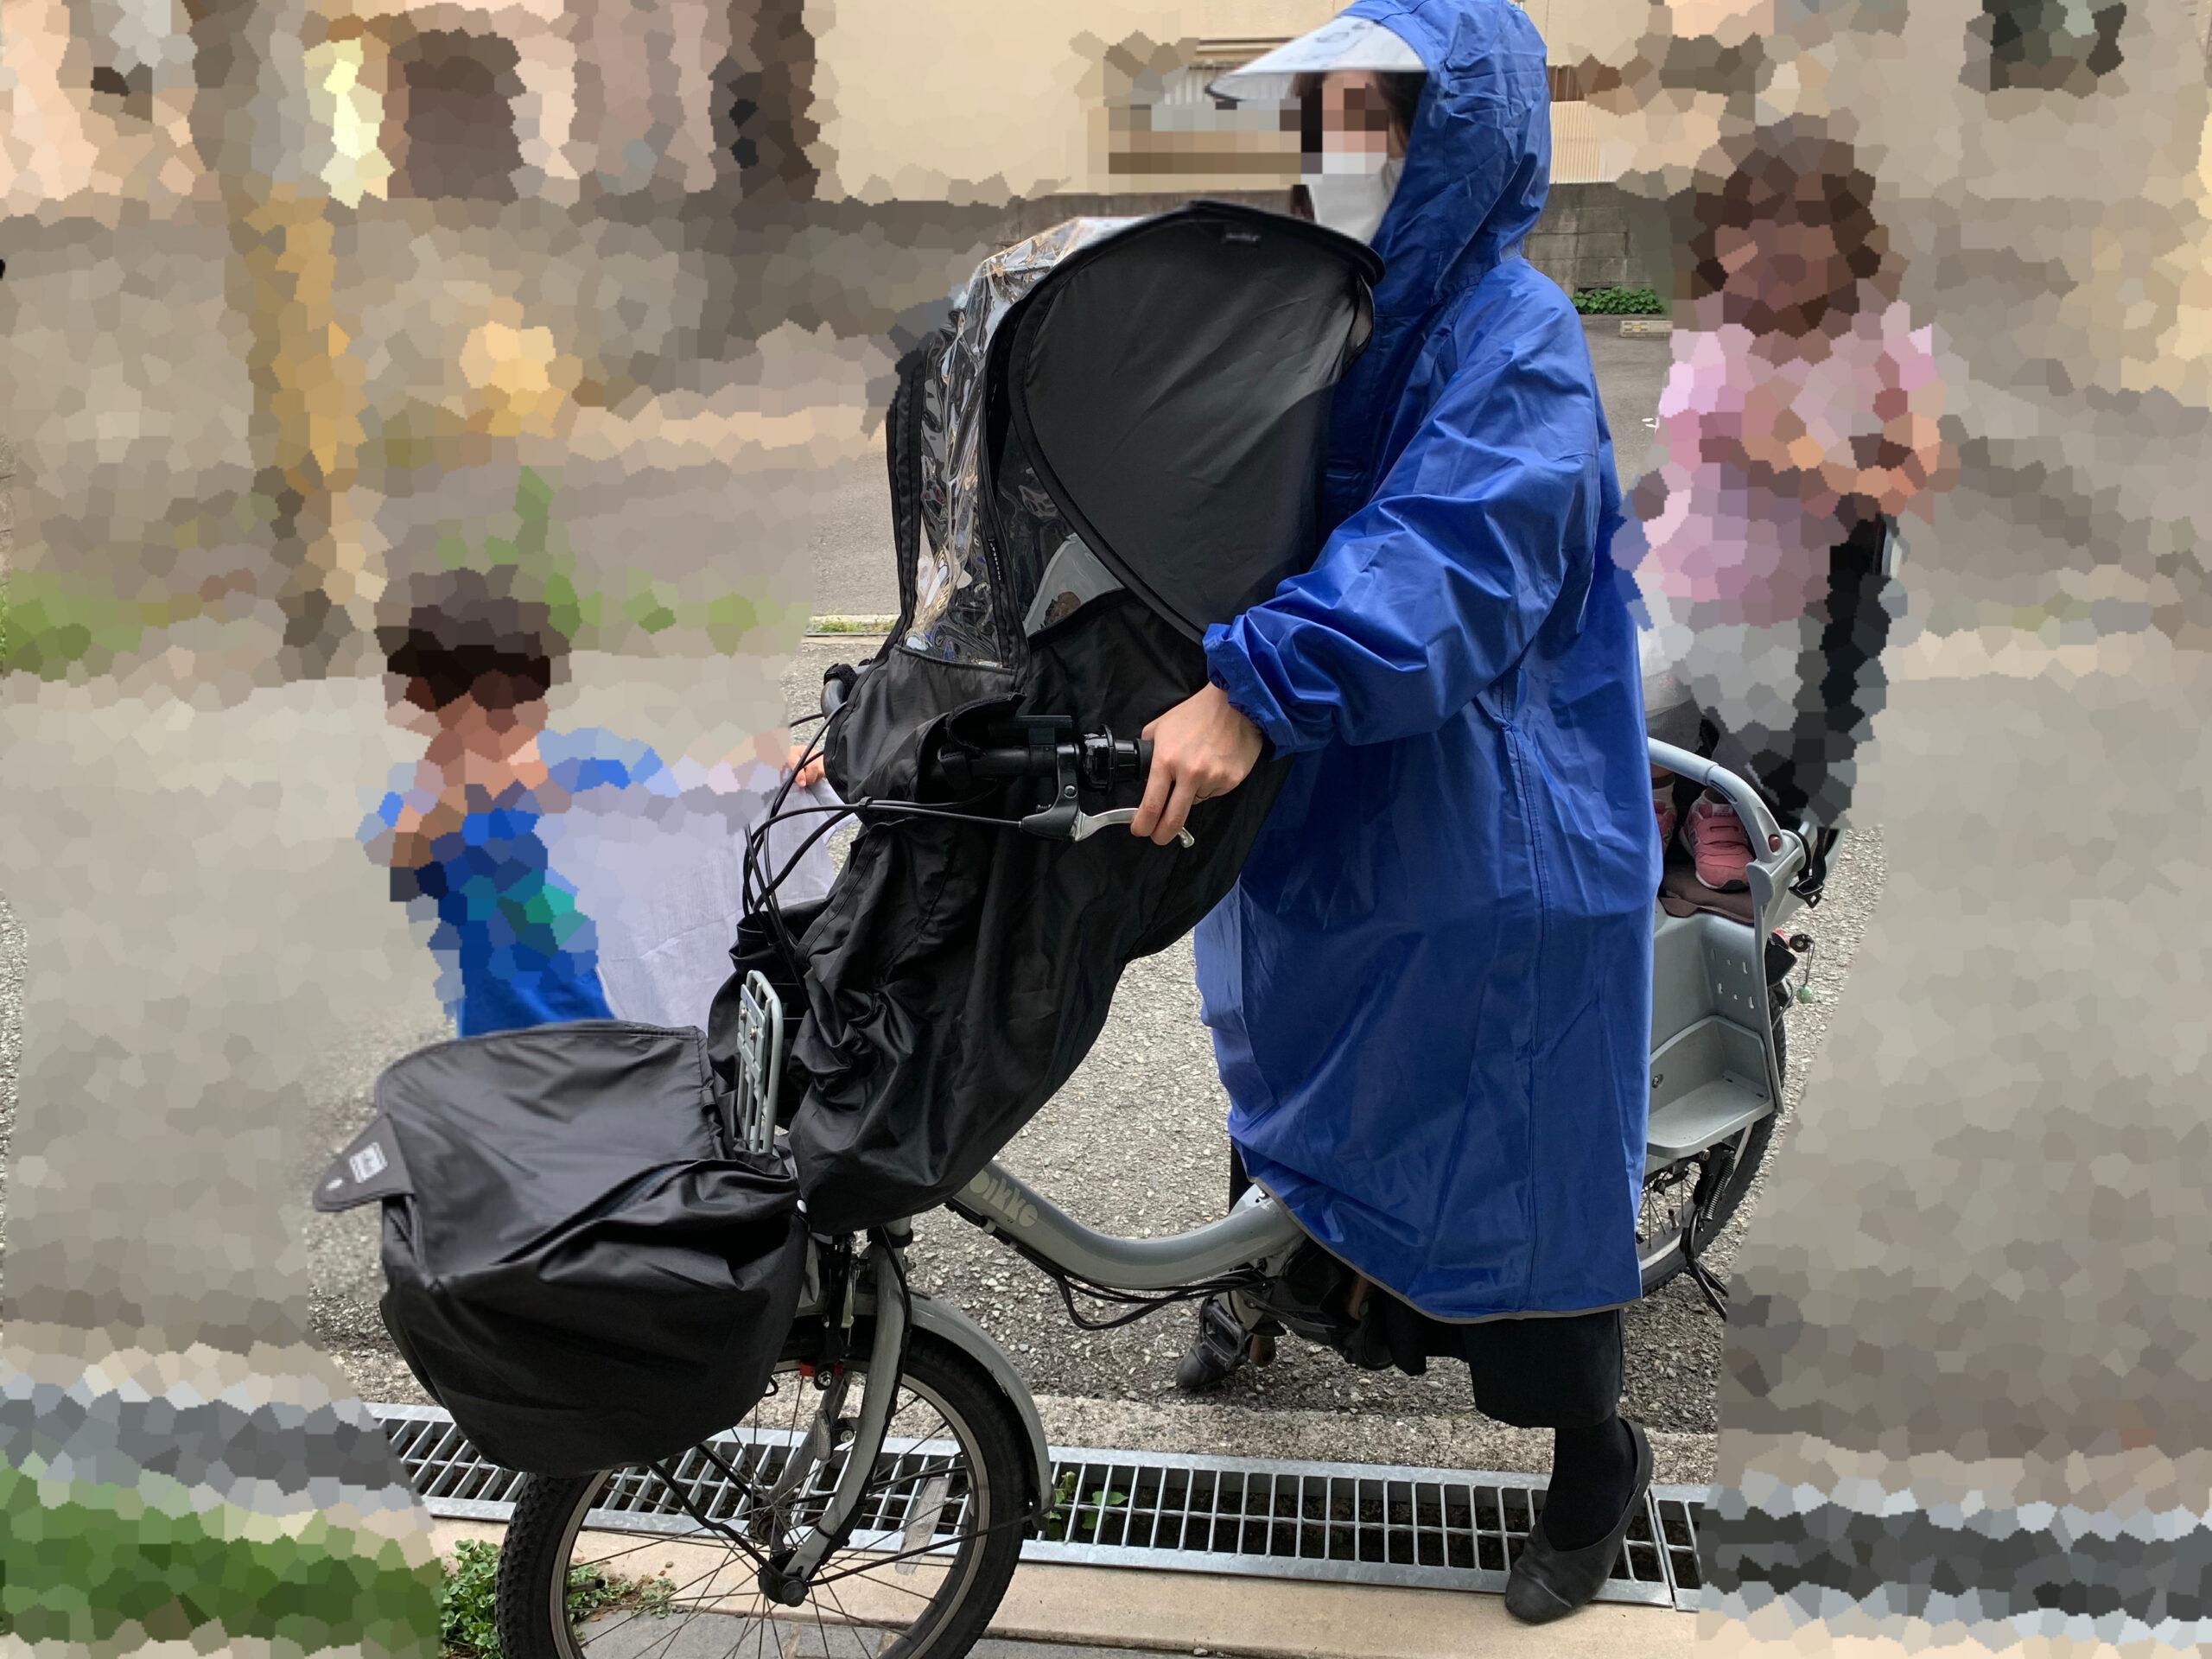 norokkaノロッカの前座席用レインカバーを着けた状態で電動自転車bikkeビッケに乗っている